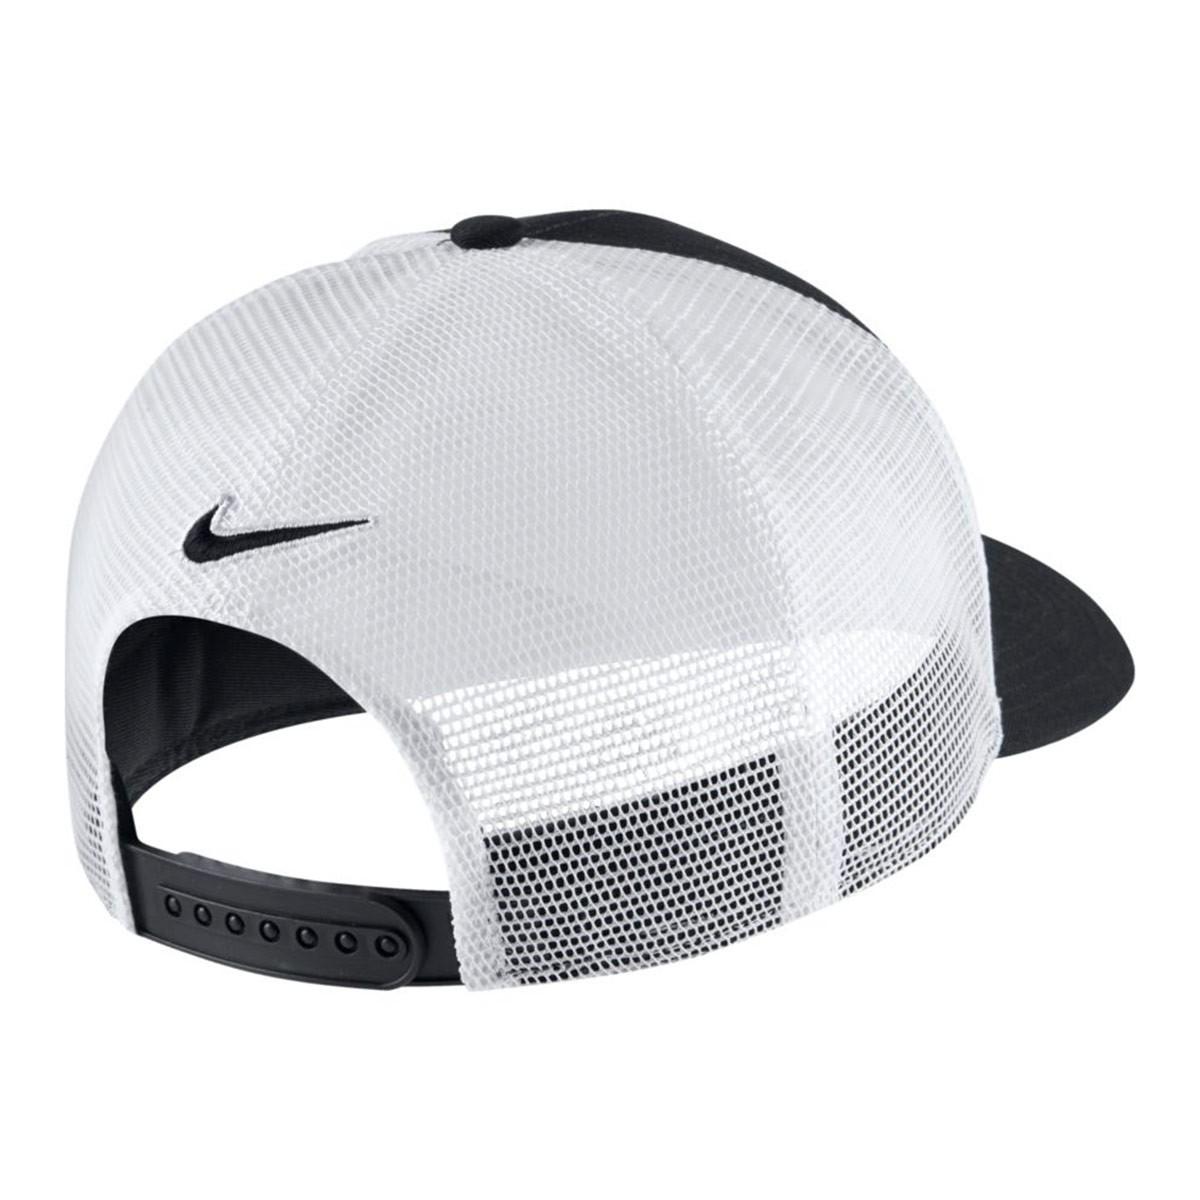 scarpe da ginnastica migliori scarpe da ginnastica ampia selezione di design Cappello Nike Nike F.C. Classic99